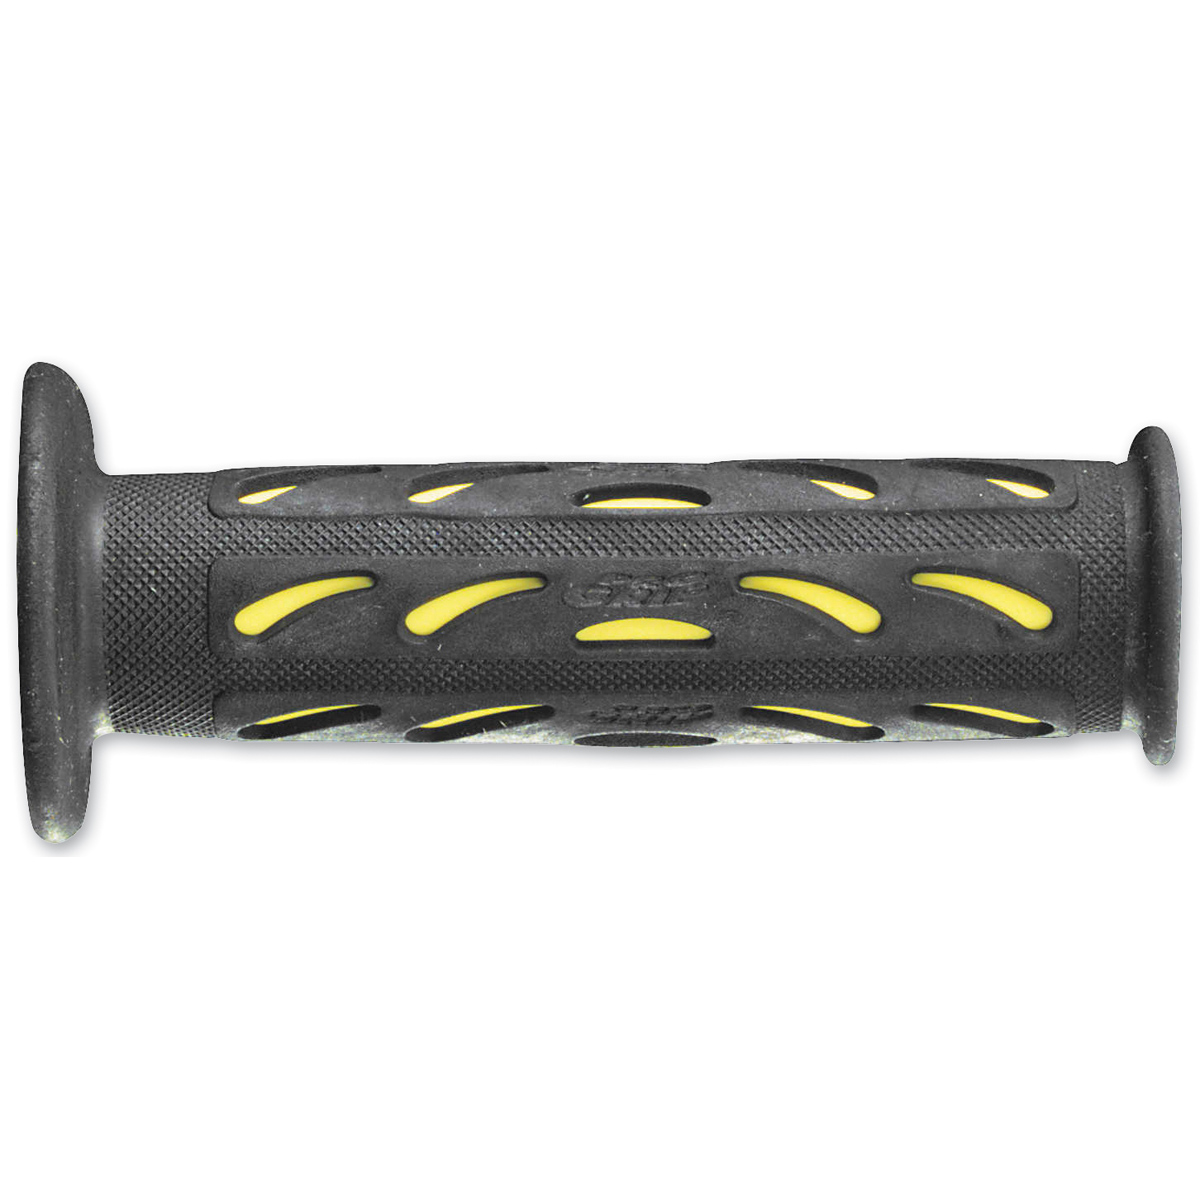 PROGRIP 727 Dual-Density Grips Black/Yellow